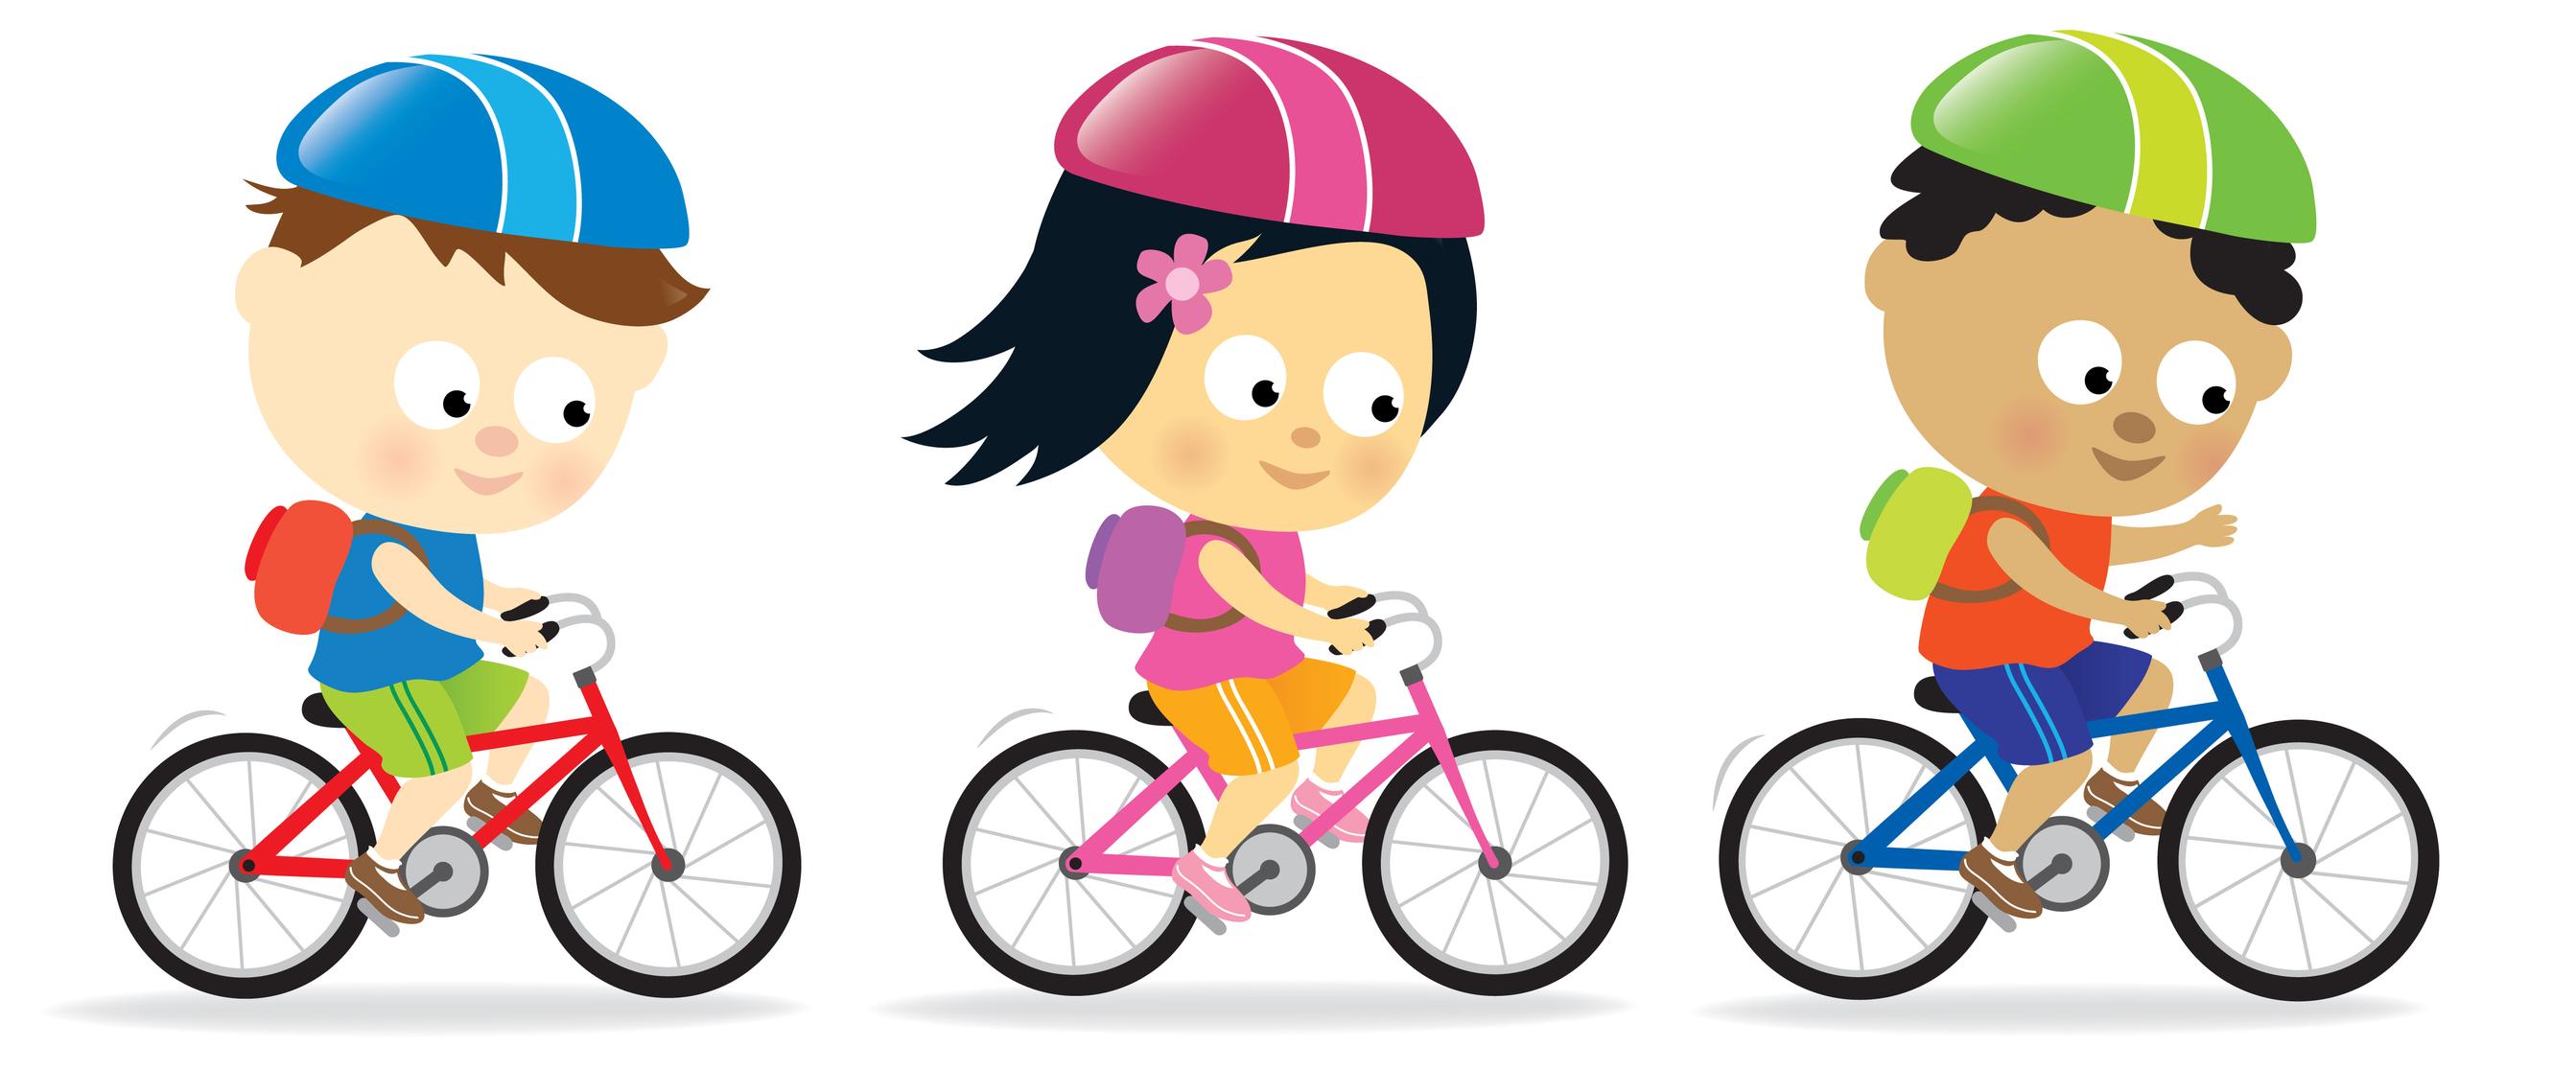 2686x1116 Biker Clipart Exercise